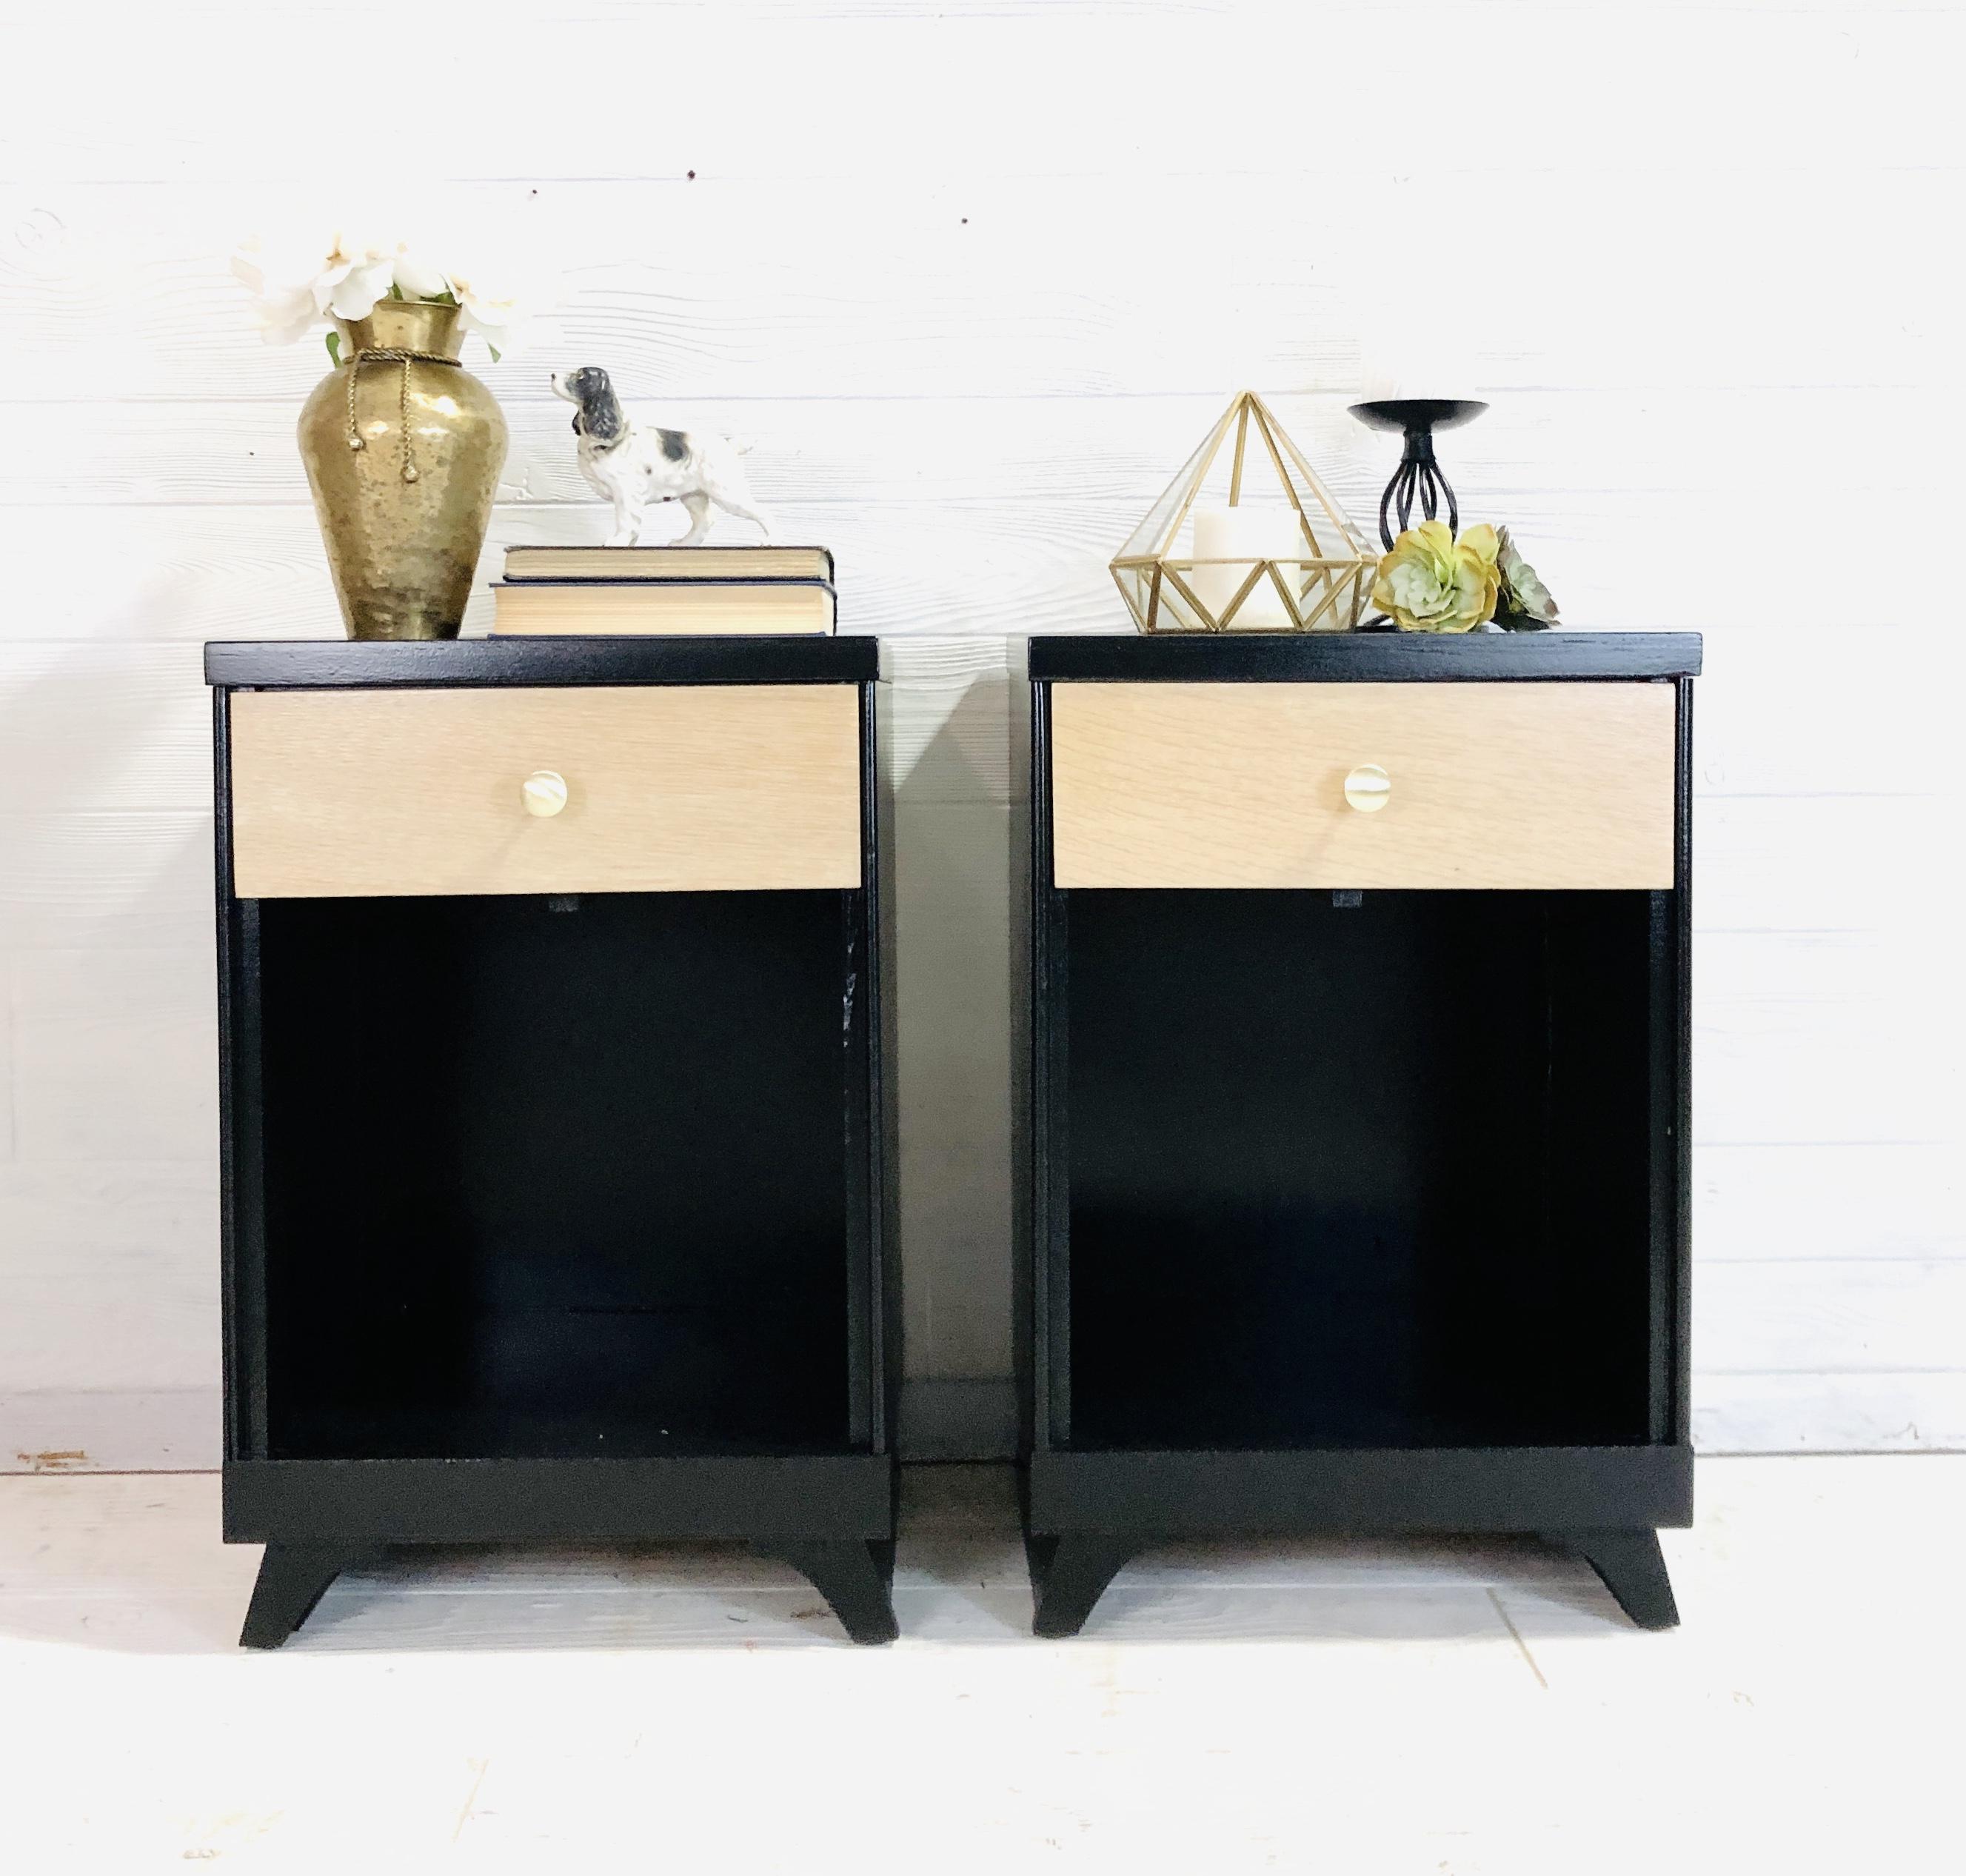 Lamp Black and Raw Wood White Wash